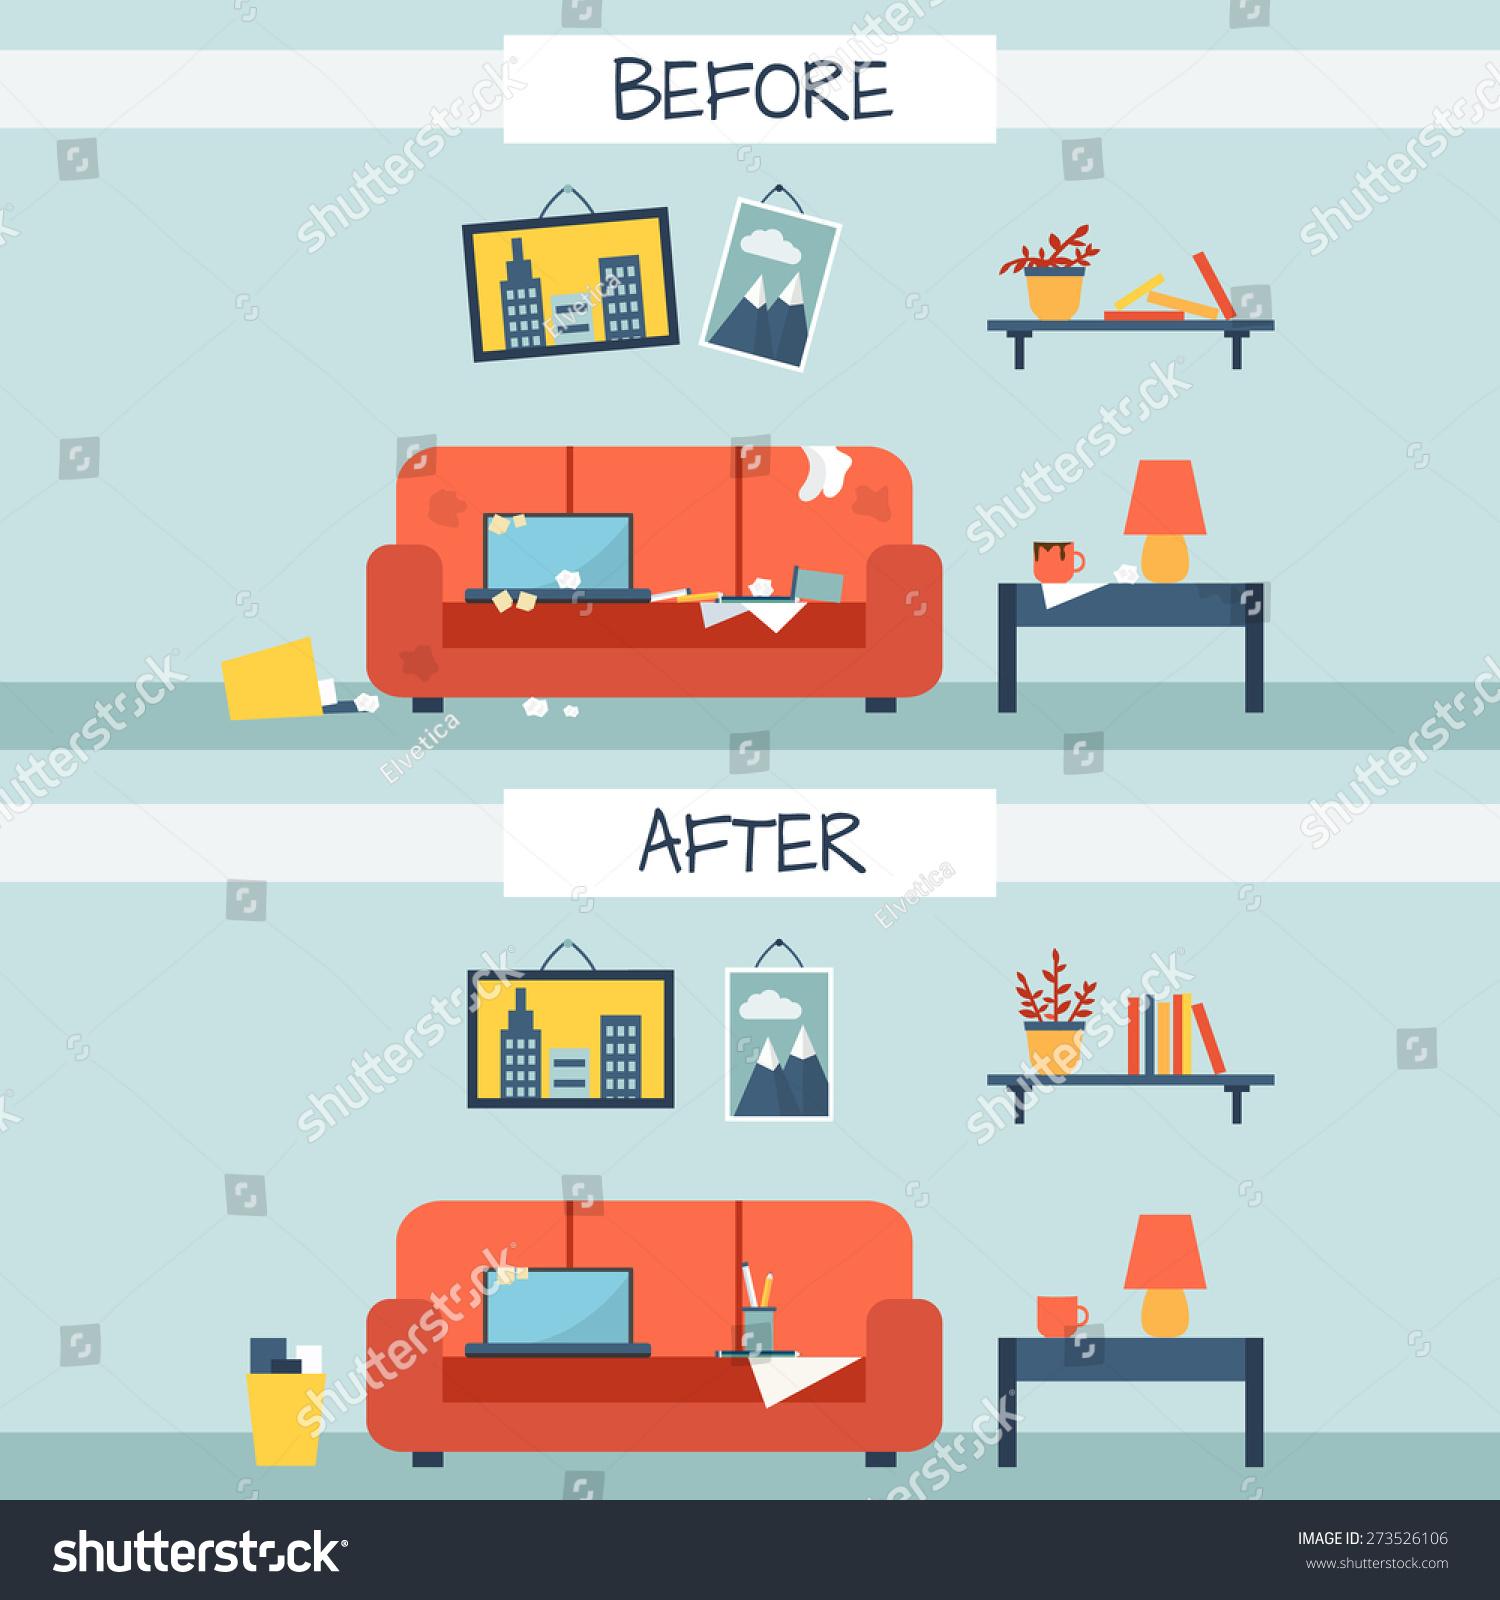 how to clean stuck shutter